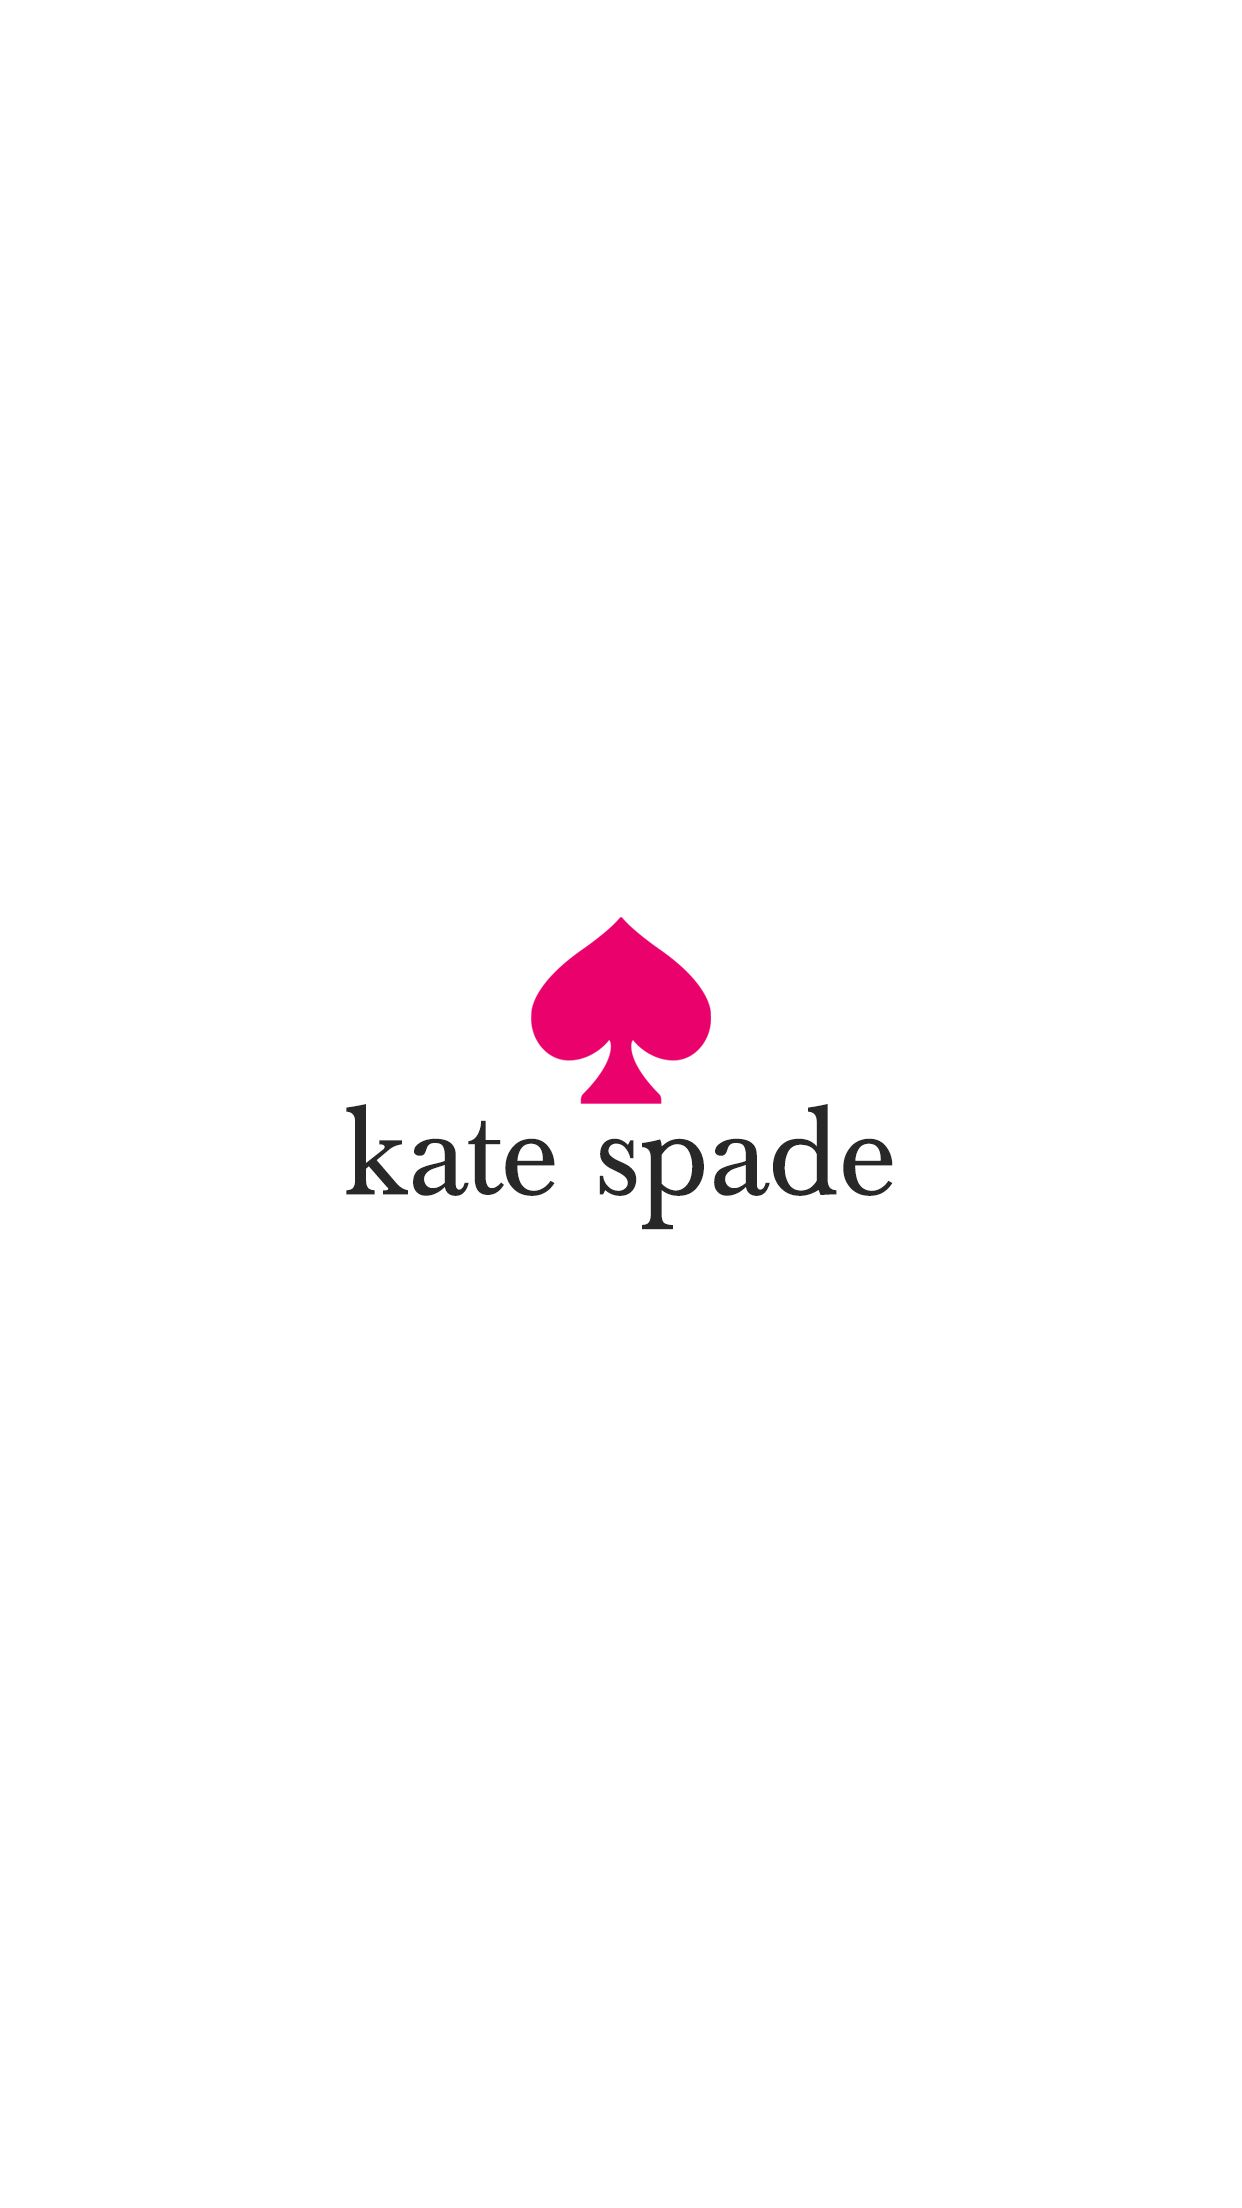 Kate Spade Hot Pink Iphone Wallpaper Background Kate Spade Wallpaper Kate Spade Quotes Kate Spade